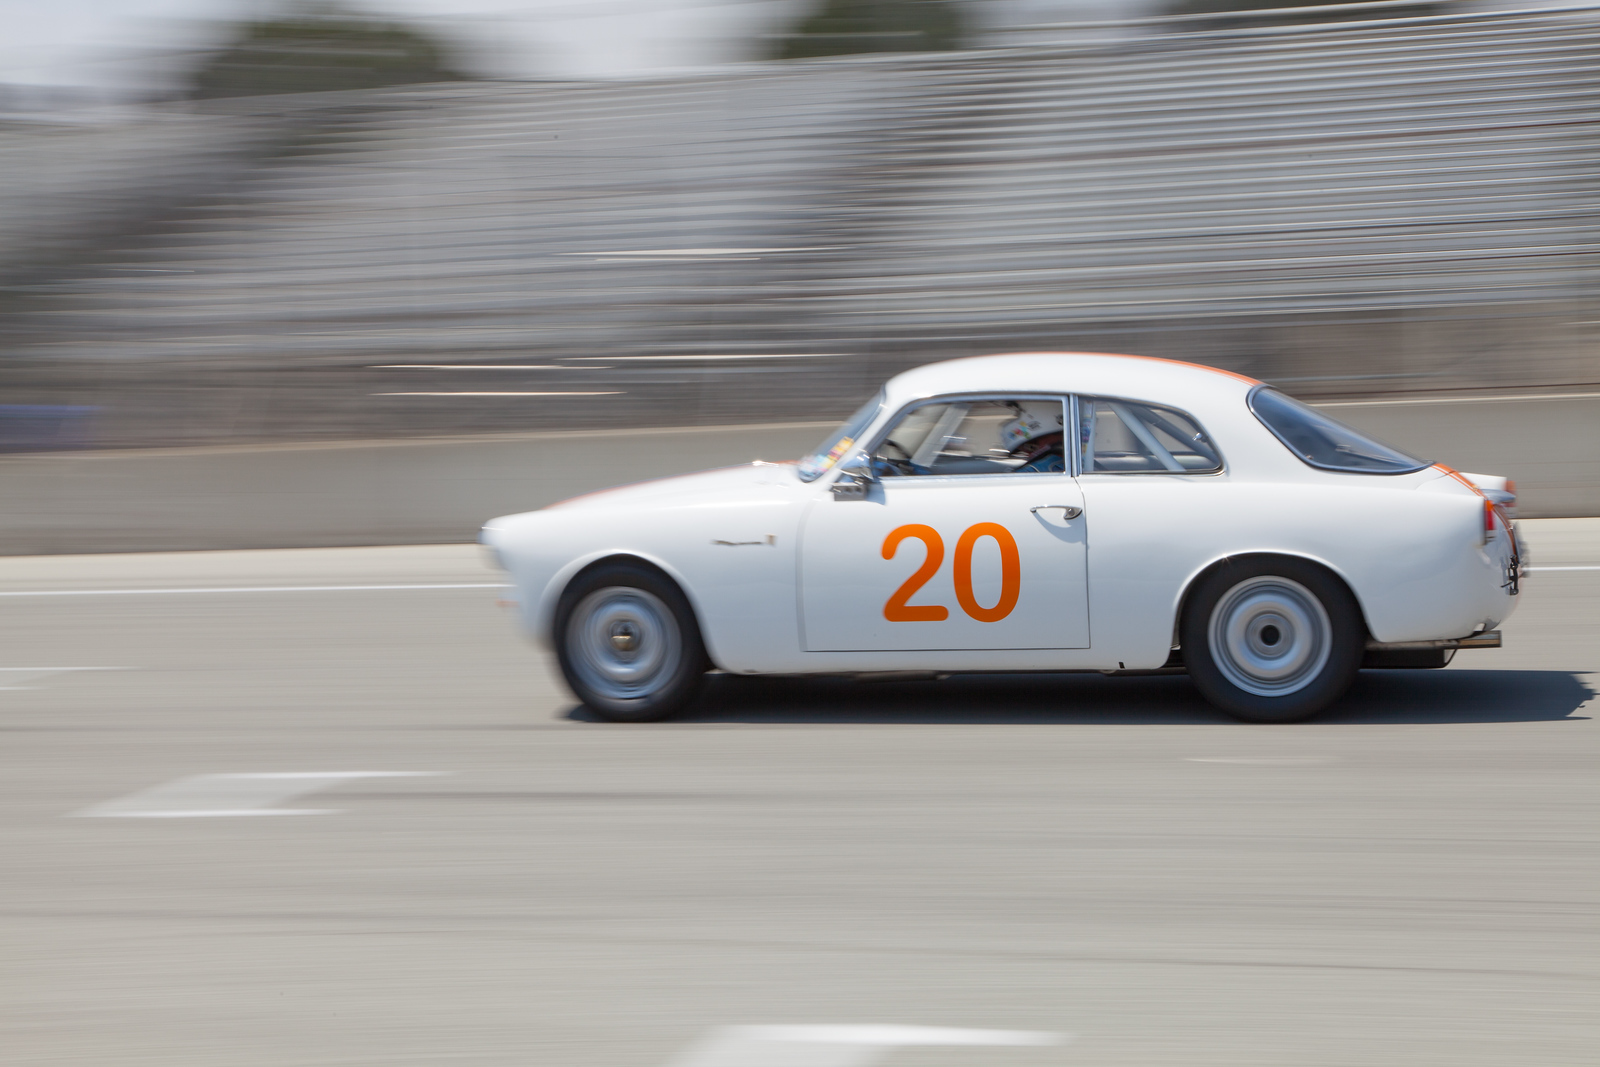 George Jewett - 1957 Alfa Romeo Sprint Veloce Alleggerita